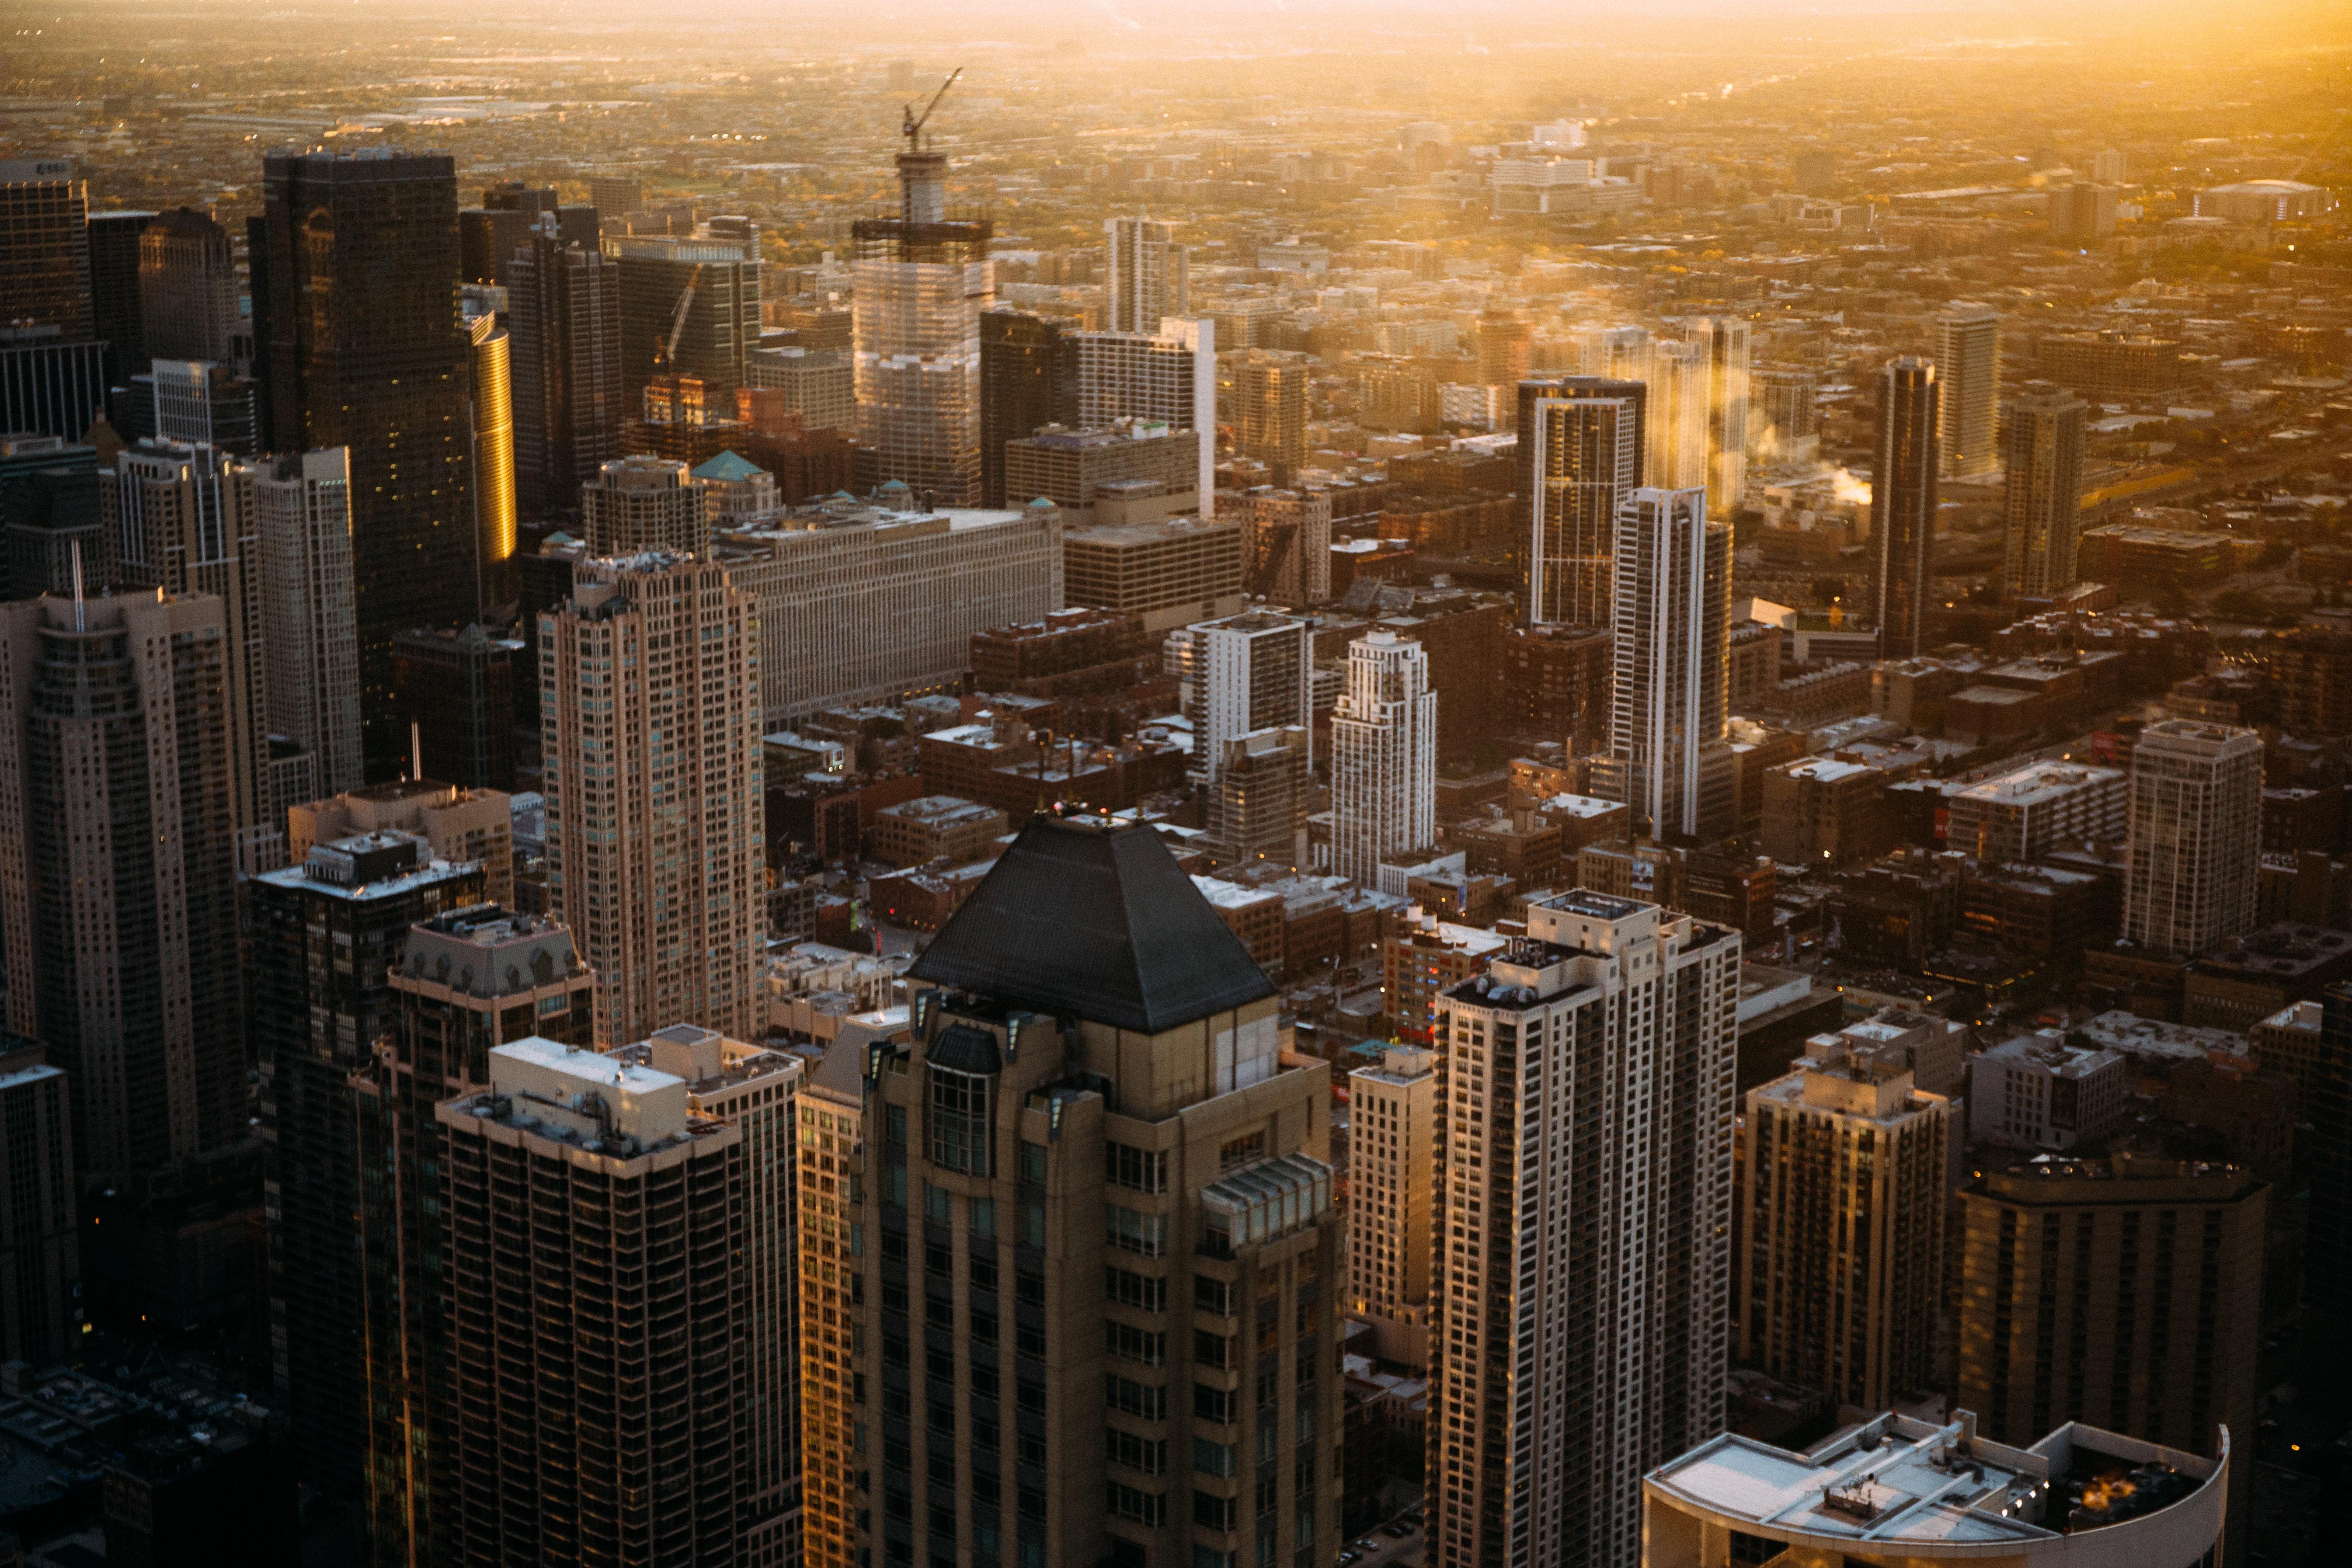 bird's eye photography of high-rise buildings